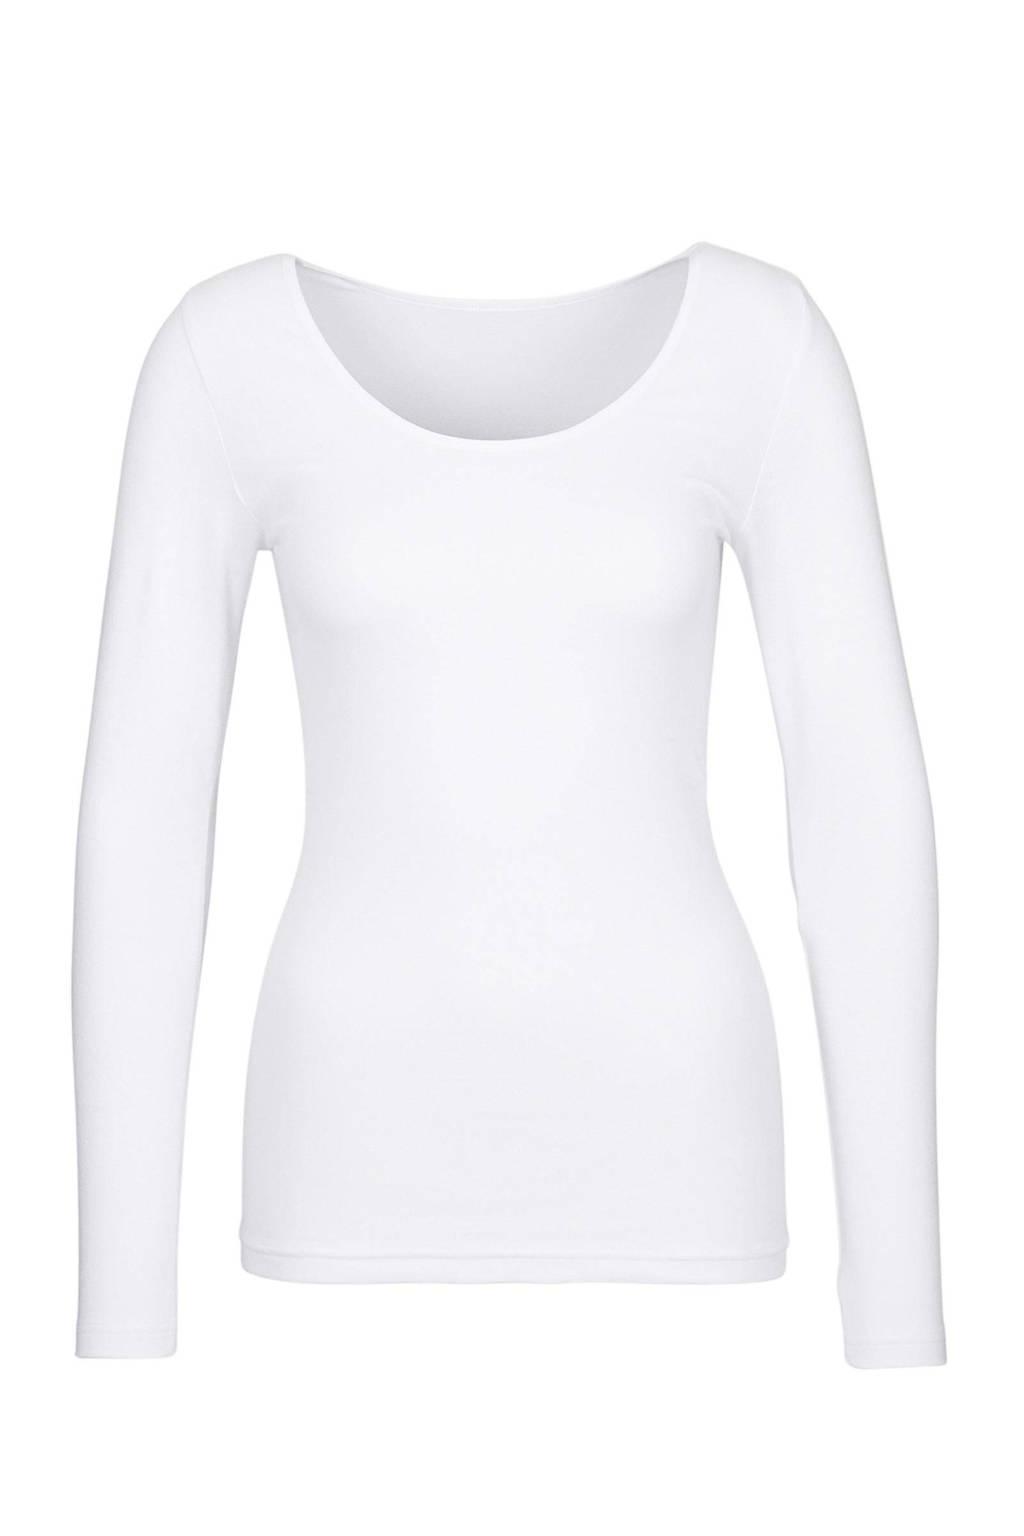 whkmp's own ondershirt met ronde hals wit, Wit